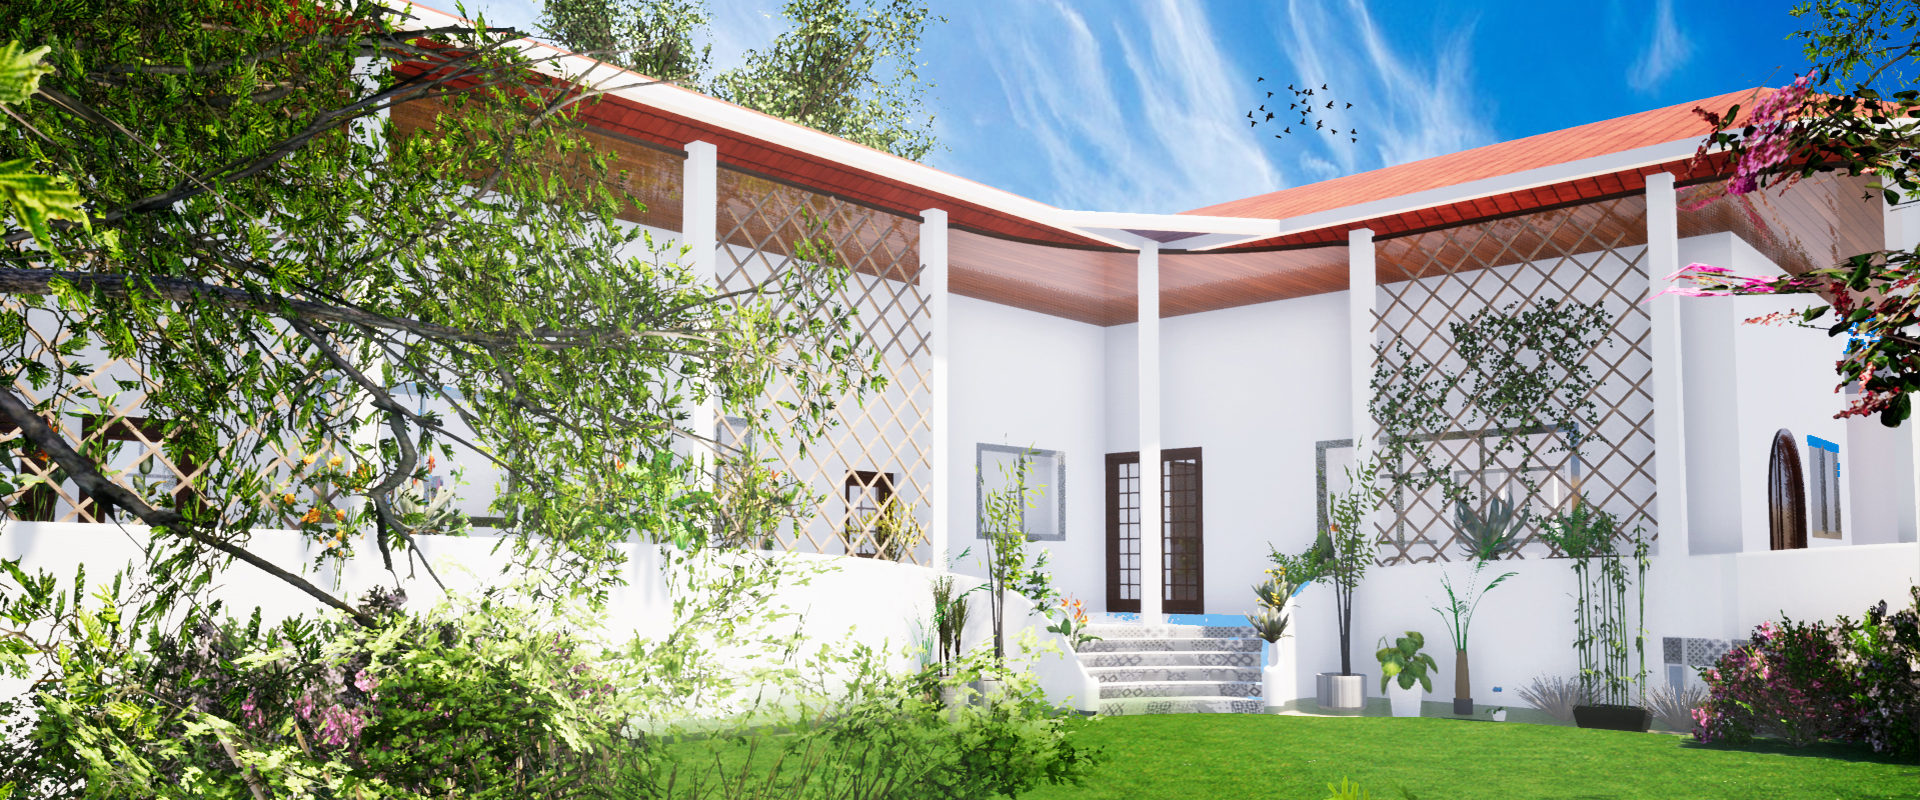 Villa Douala Bell_VILLA DB_1__barla_architectes_douala_cameroun